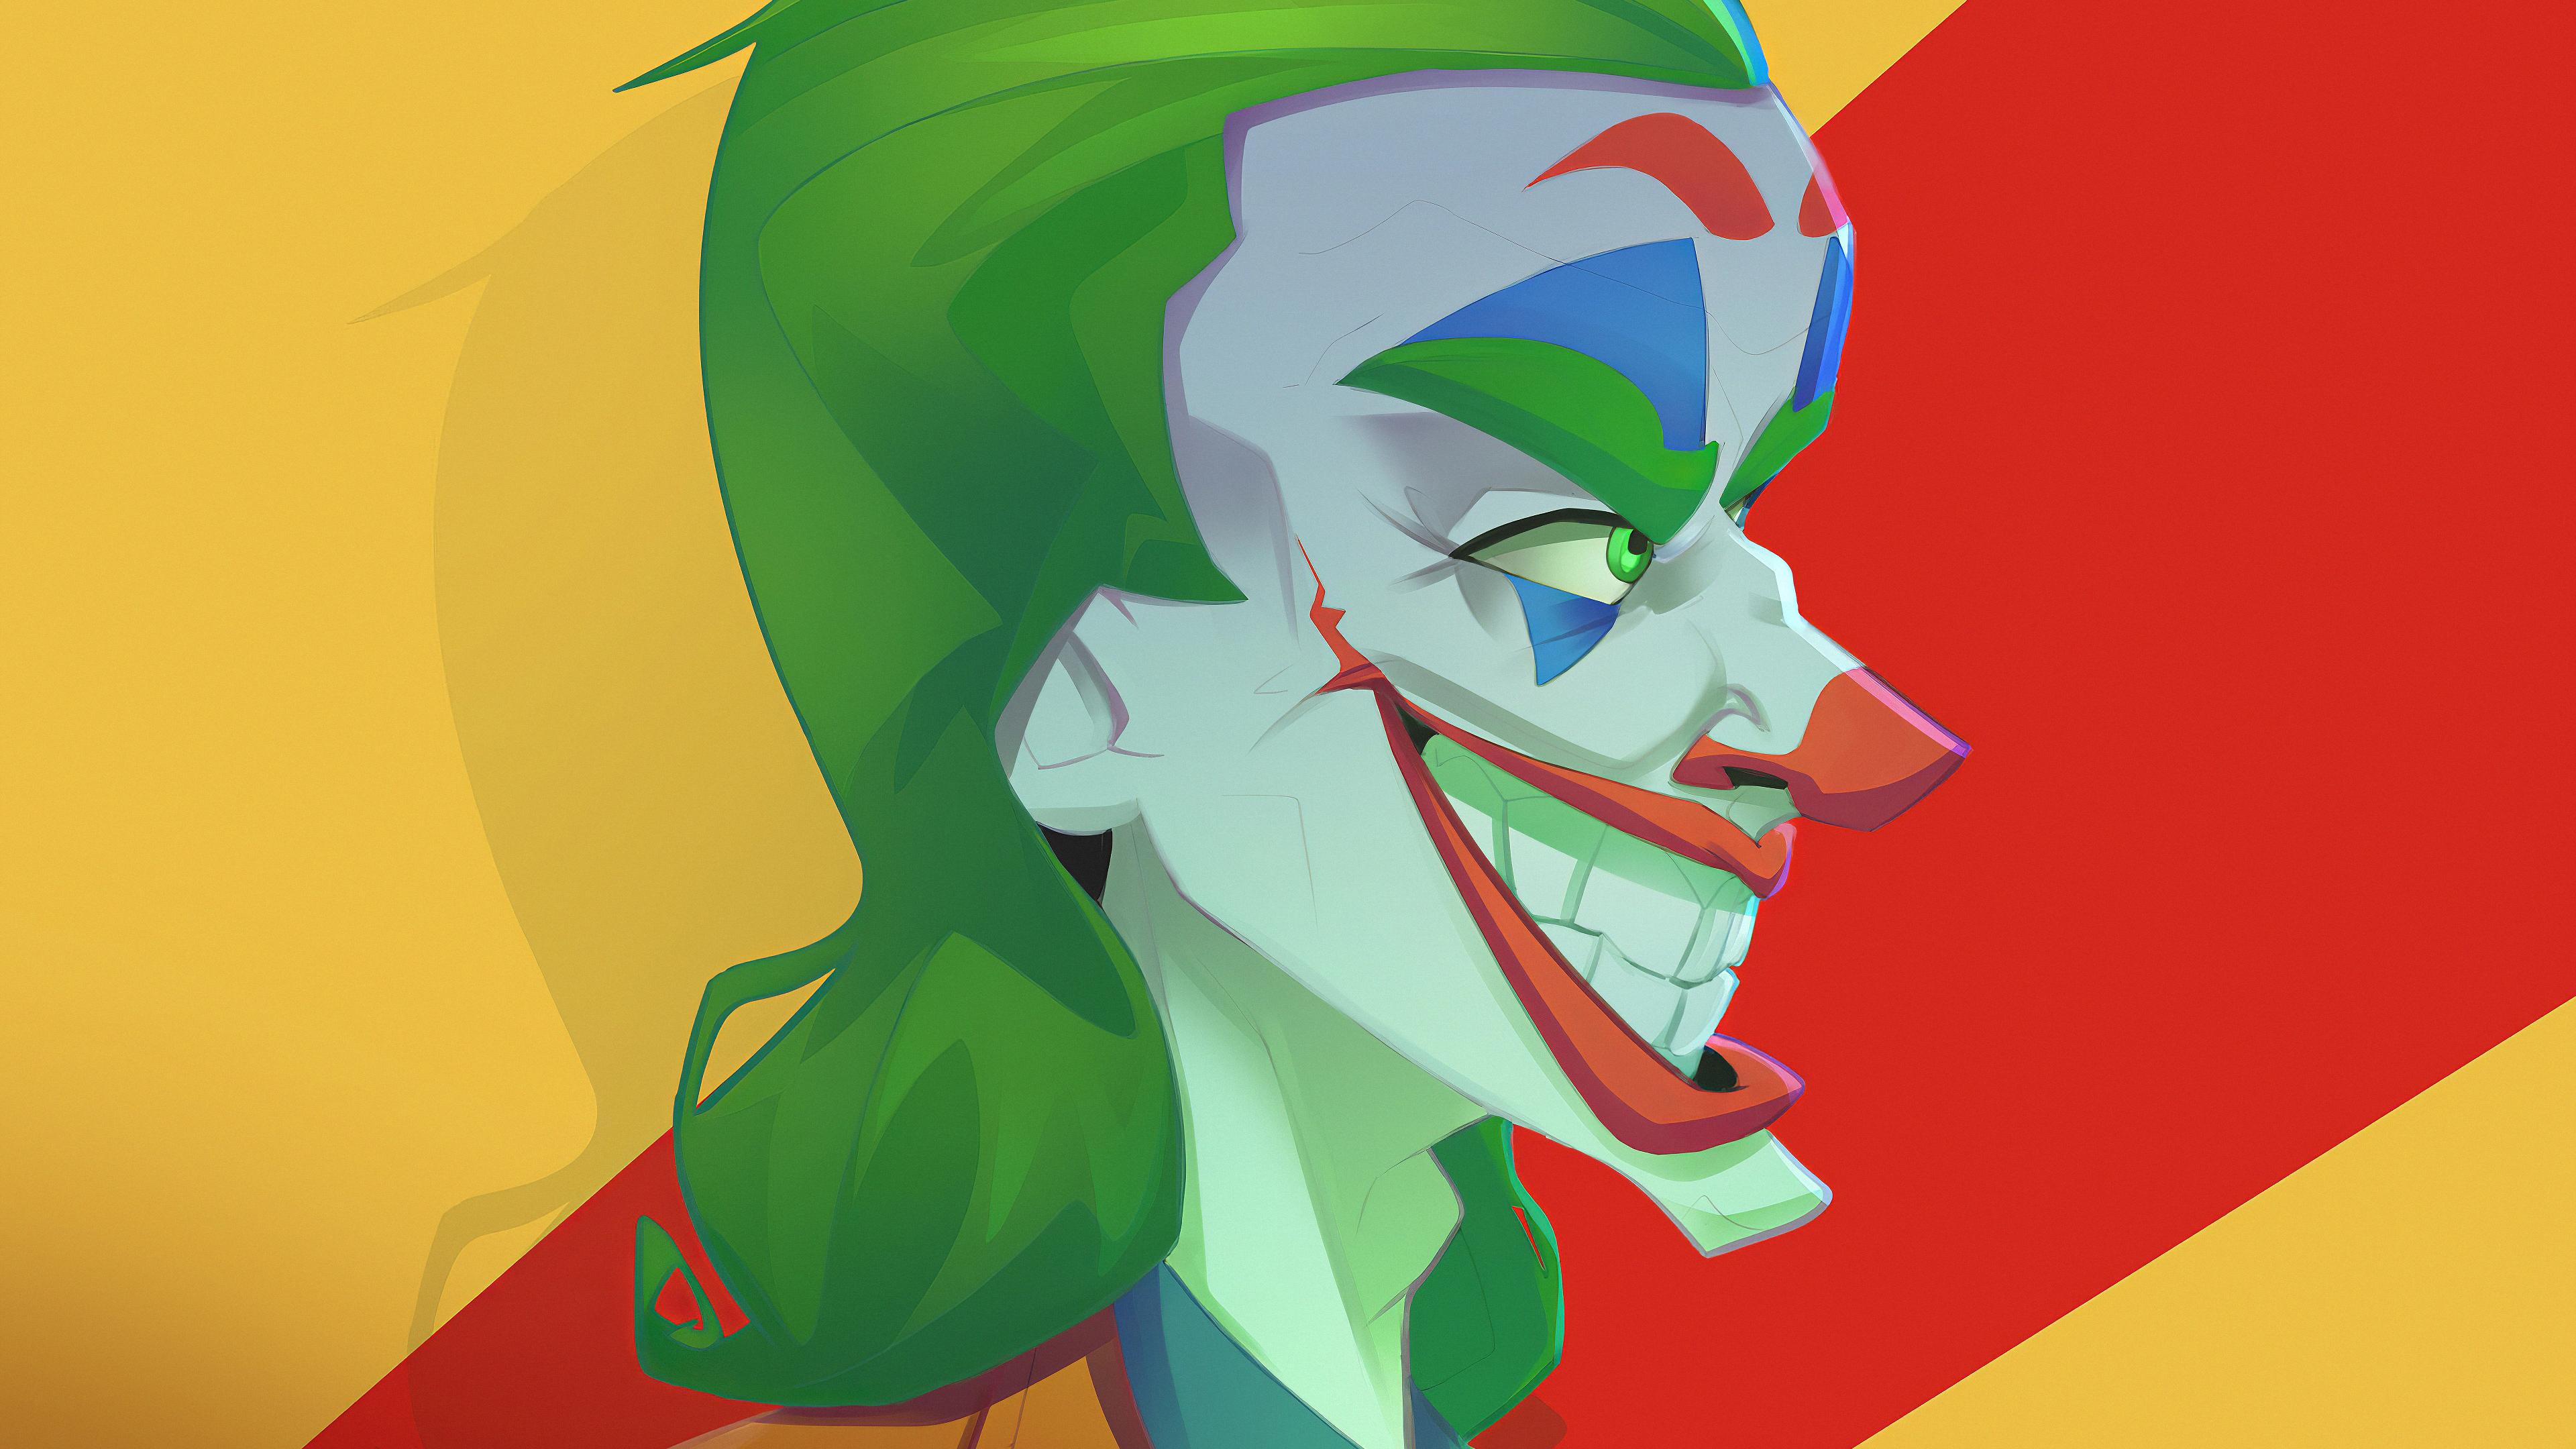 joker movie sketch art 1572368758 - Joker Movie Sketch Art - supervillain wallpapers, superheroes wallpapers, joker wallpapers, joker movie wallpapers, hd-wallpapers, 4k-wallpapers